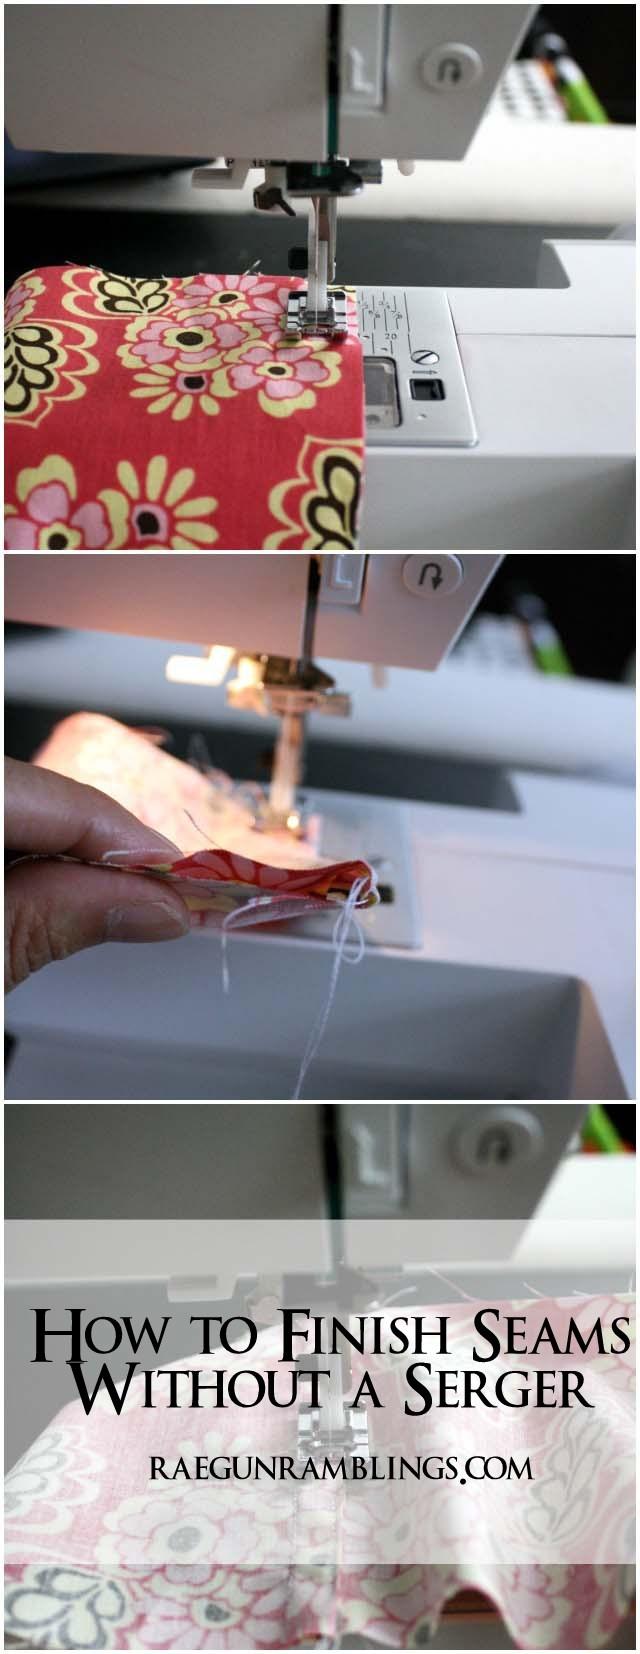 How to sew seams on sheer fabric- Rae Gun Ramblings